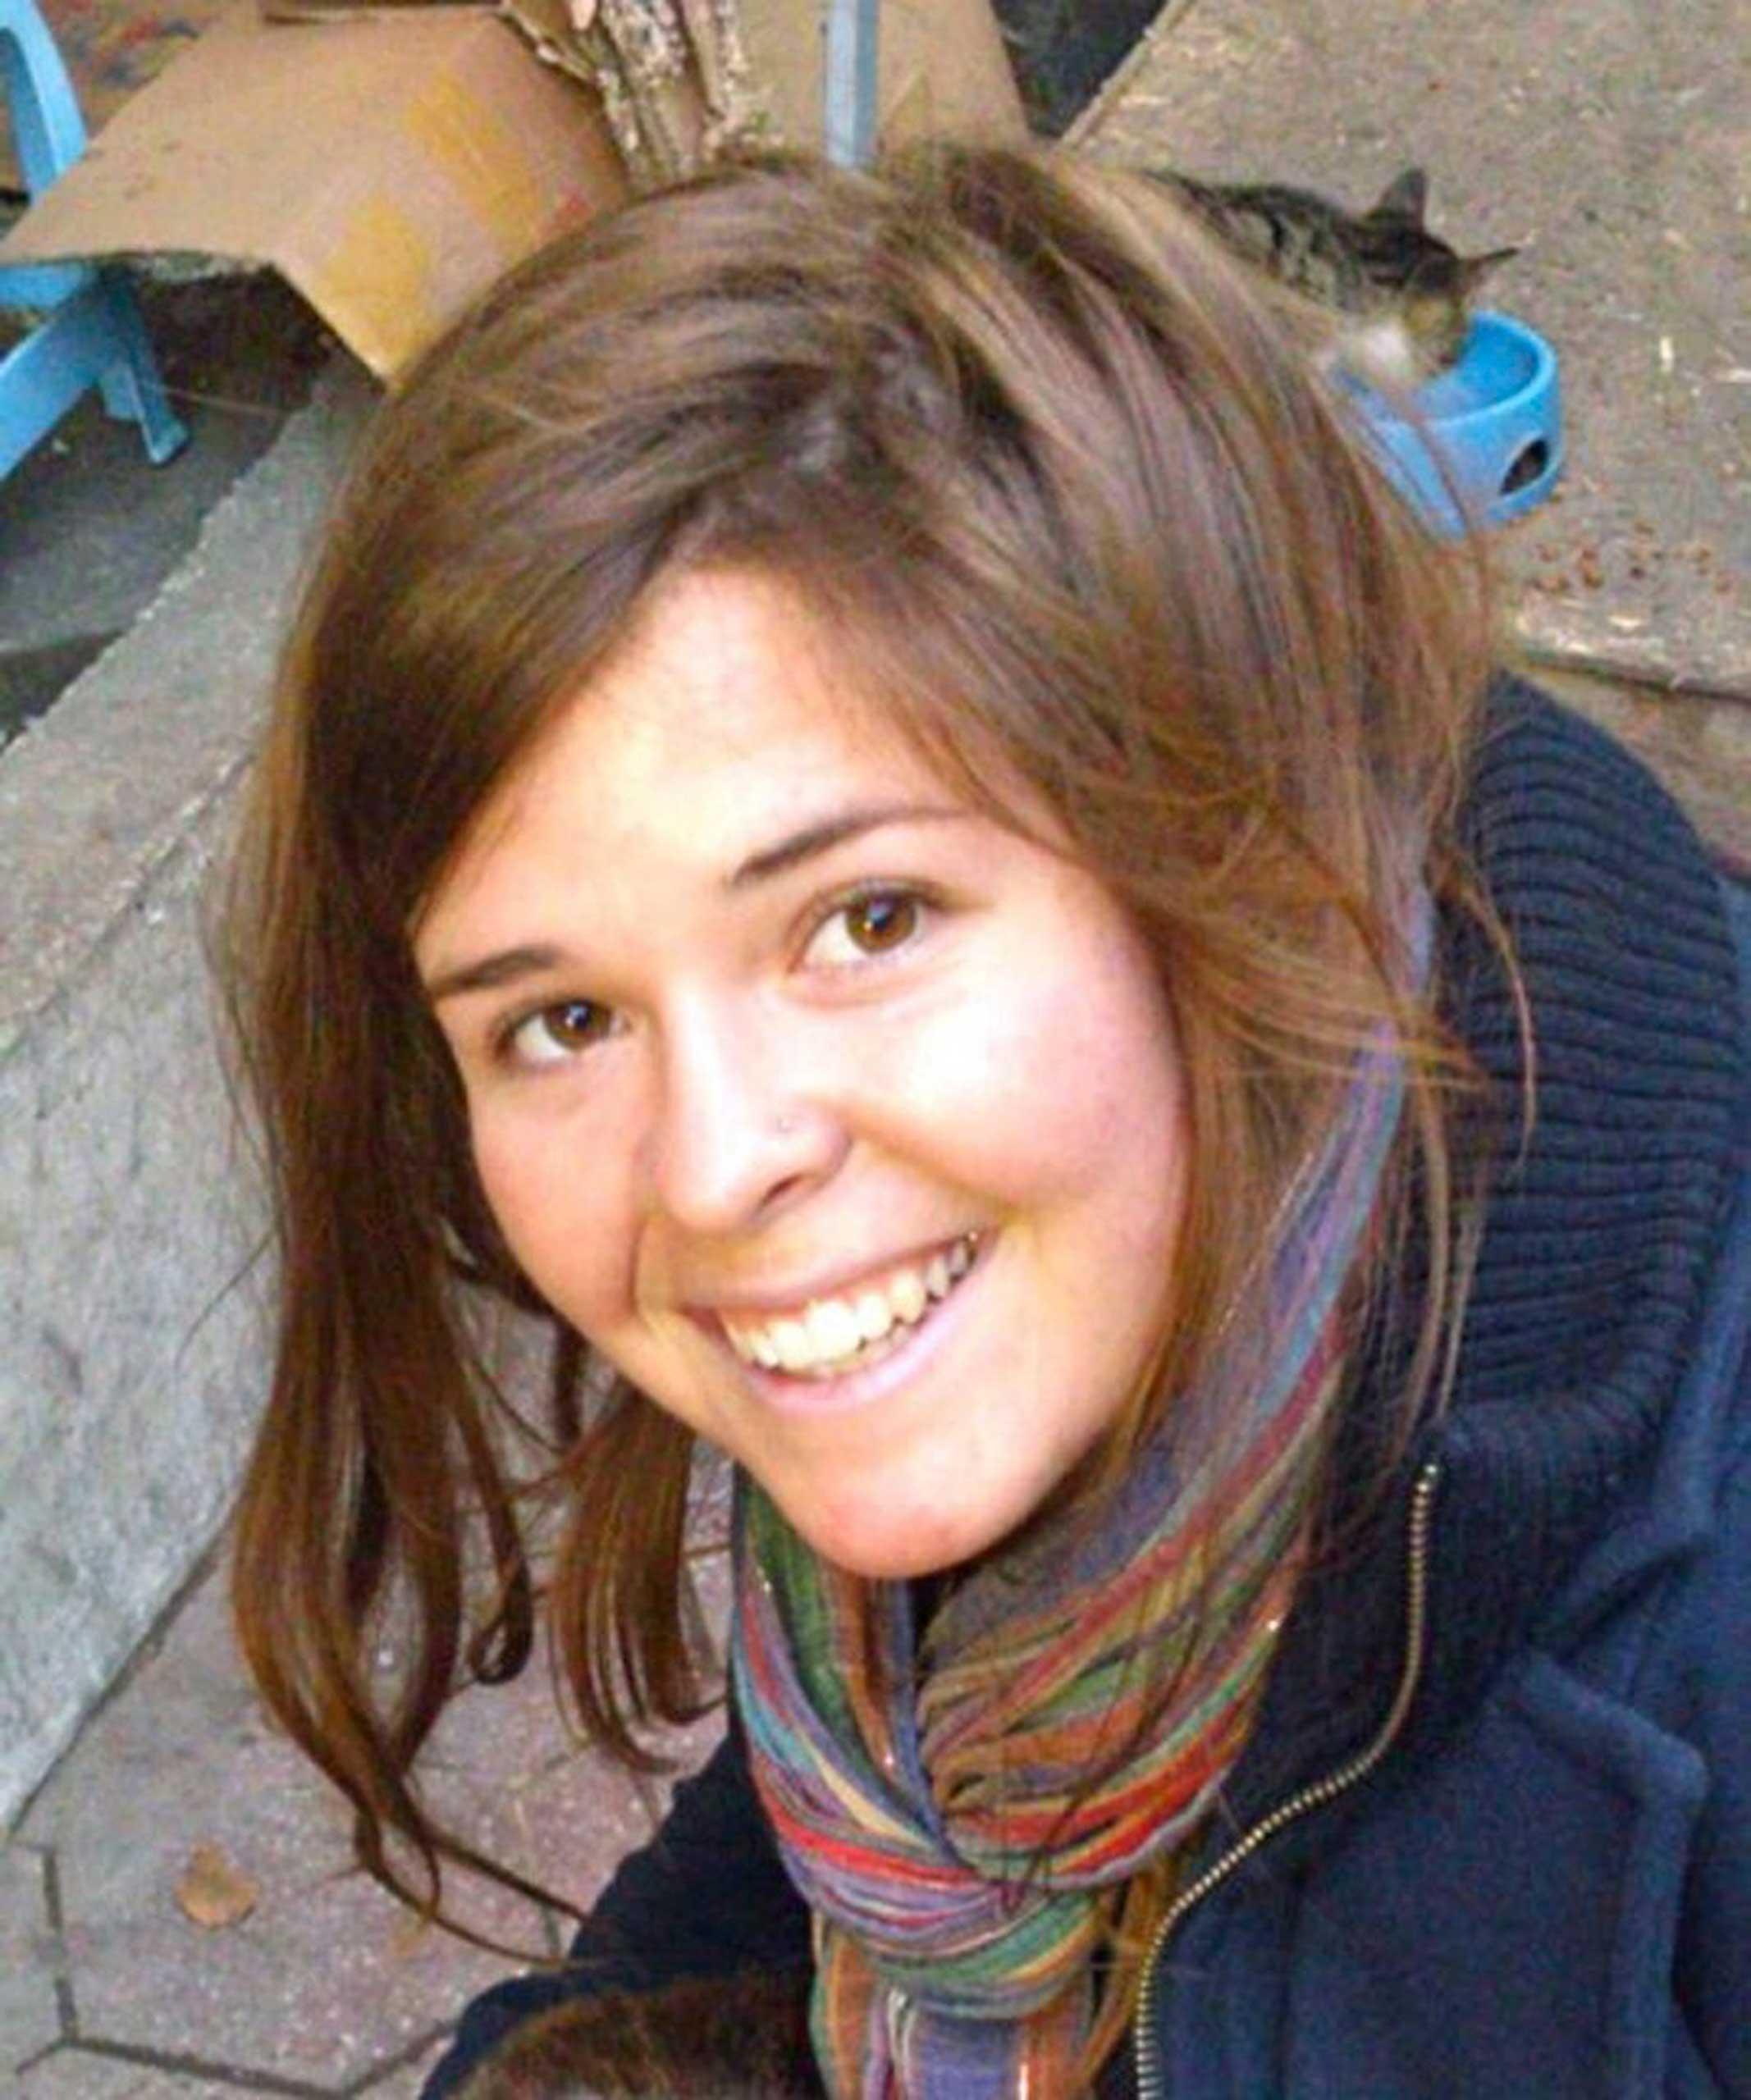 Kayla Mueller, 26, an American humanitarian worker from Prescott, Ariz.